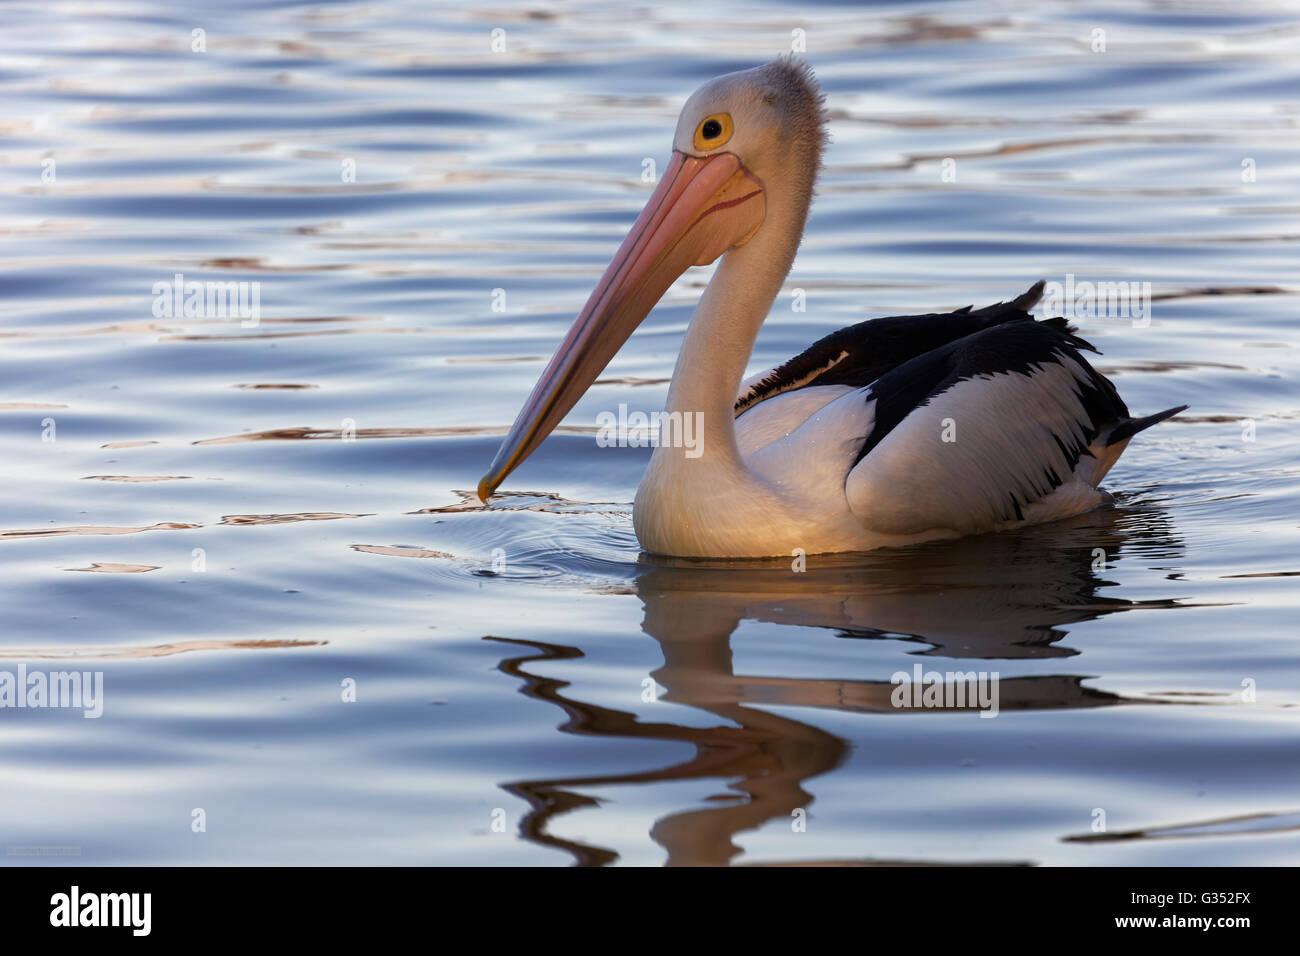 Australian pelican (Pelecanus conspicillatus) in water, Noosa River, Noosaville, Queensland, Australia - Stock Image